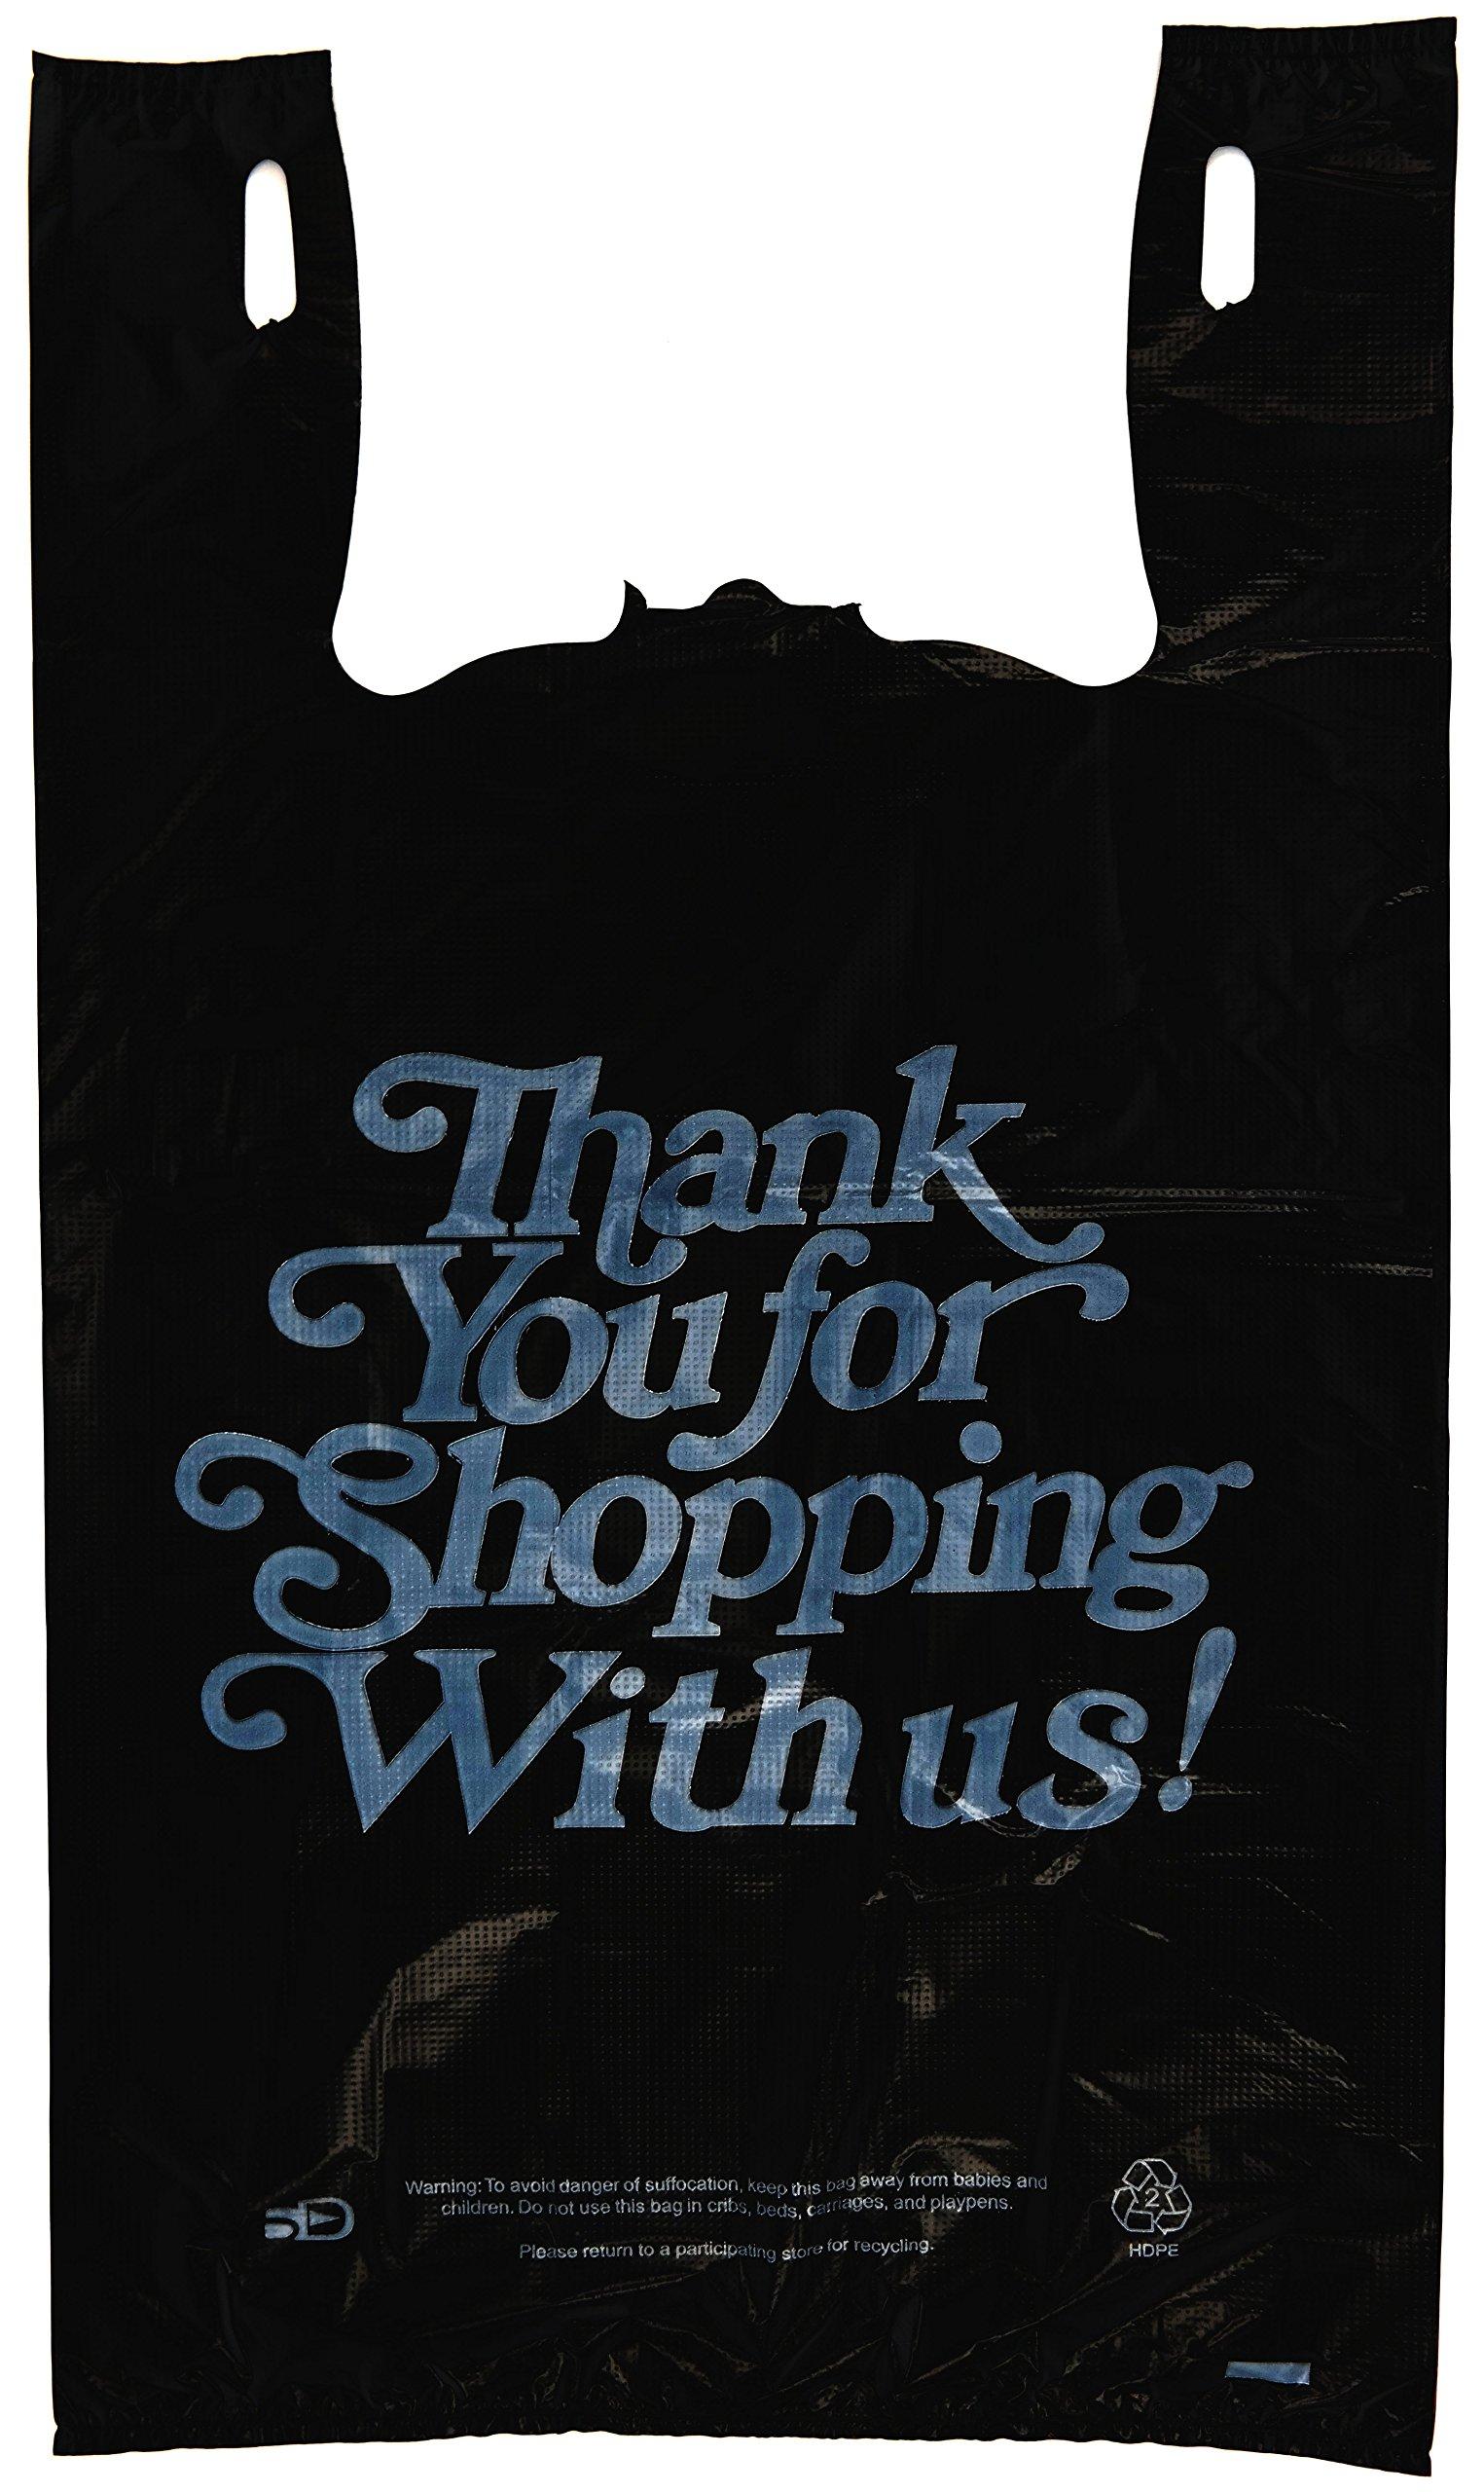 Plastic Bag-Black T-shirt Bags- Heavy Duty Oversized Thank you Bag 13''x10''x23'' - 21 microns